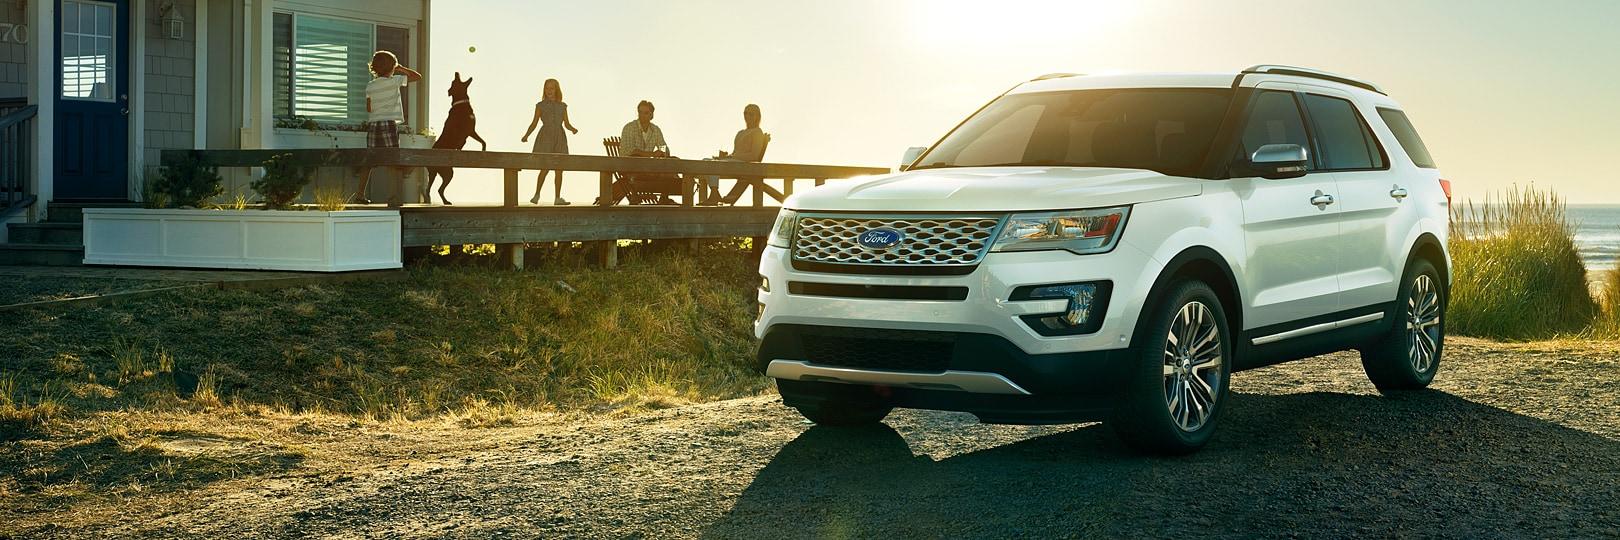 Ford Dealer Duluth GA New Used Ford Dealership - Nearest ford dealership